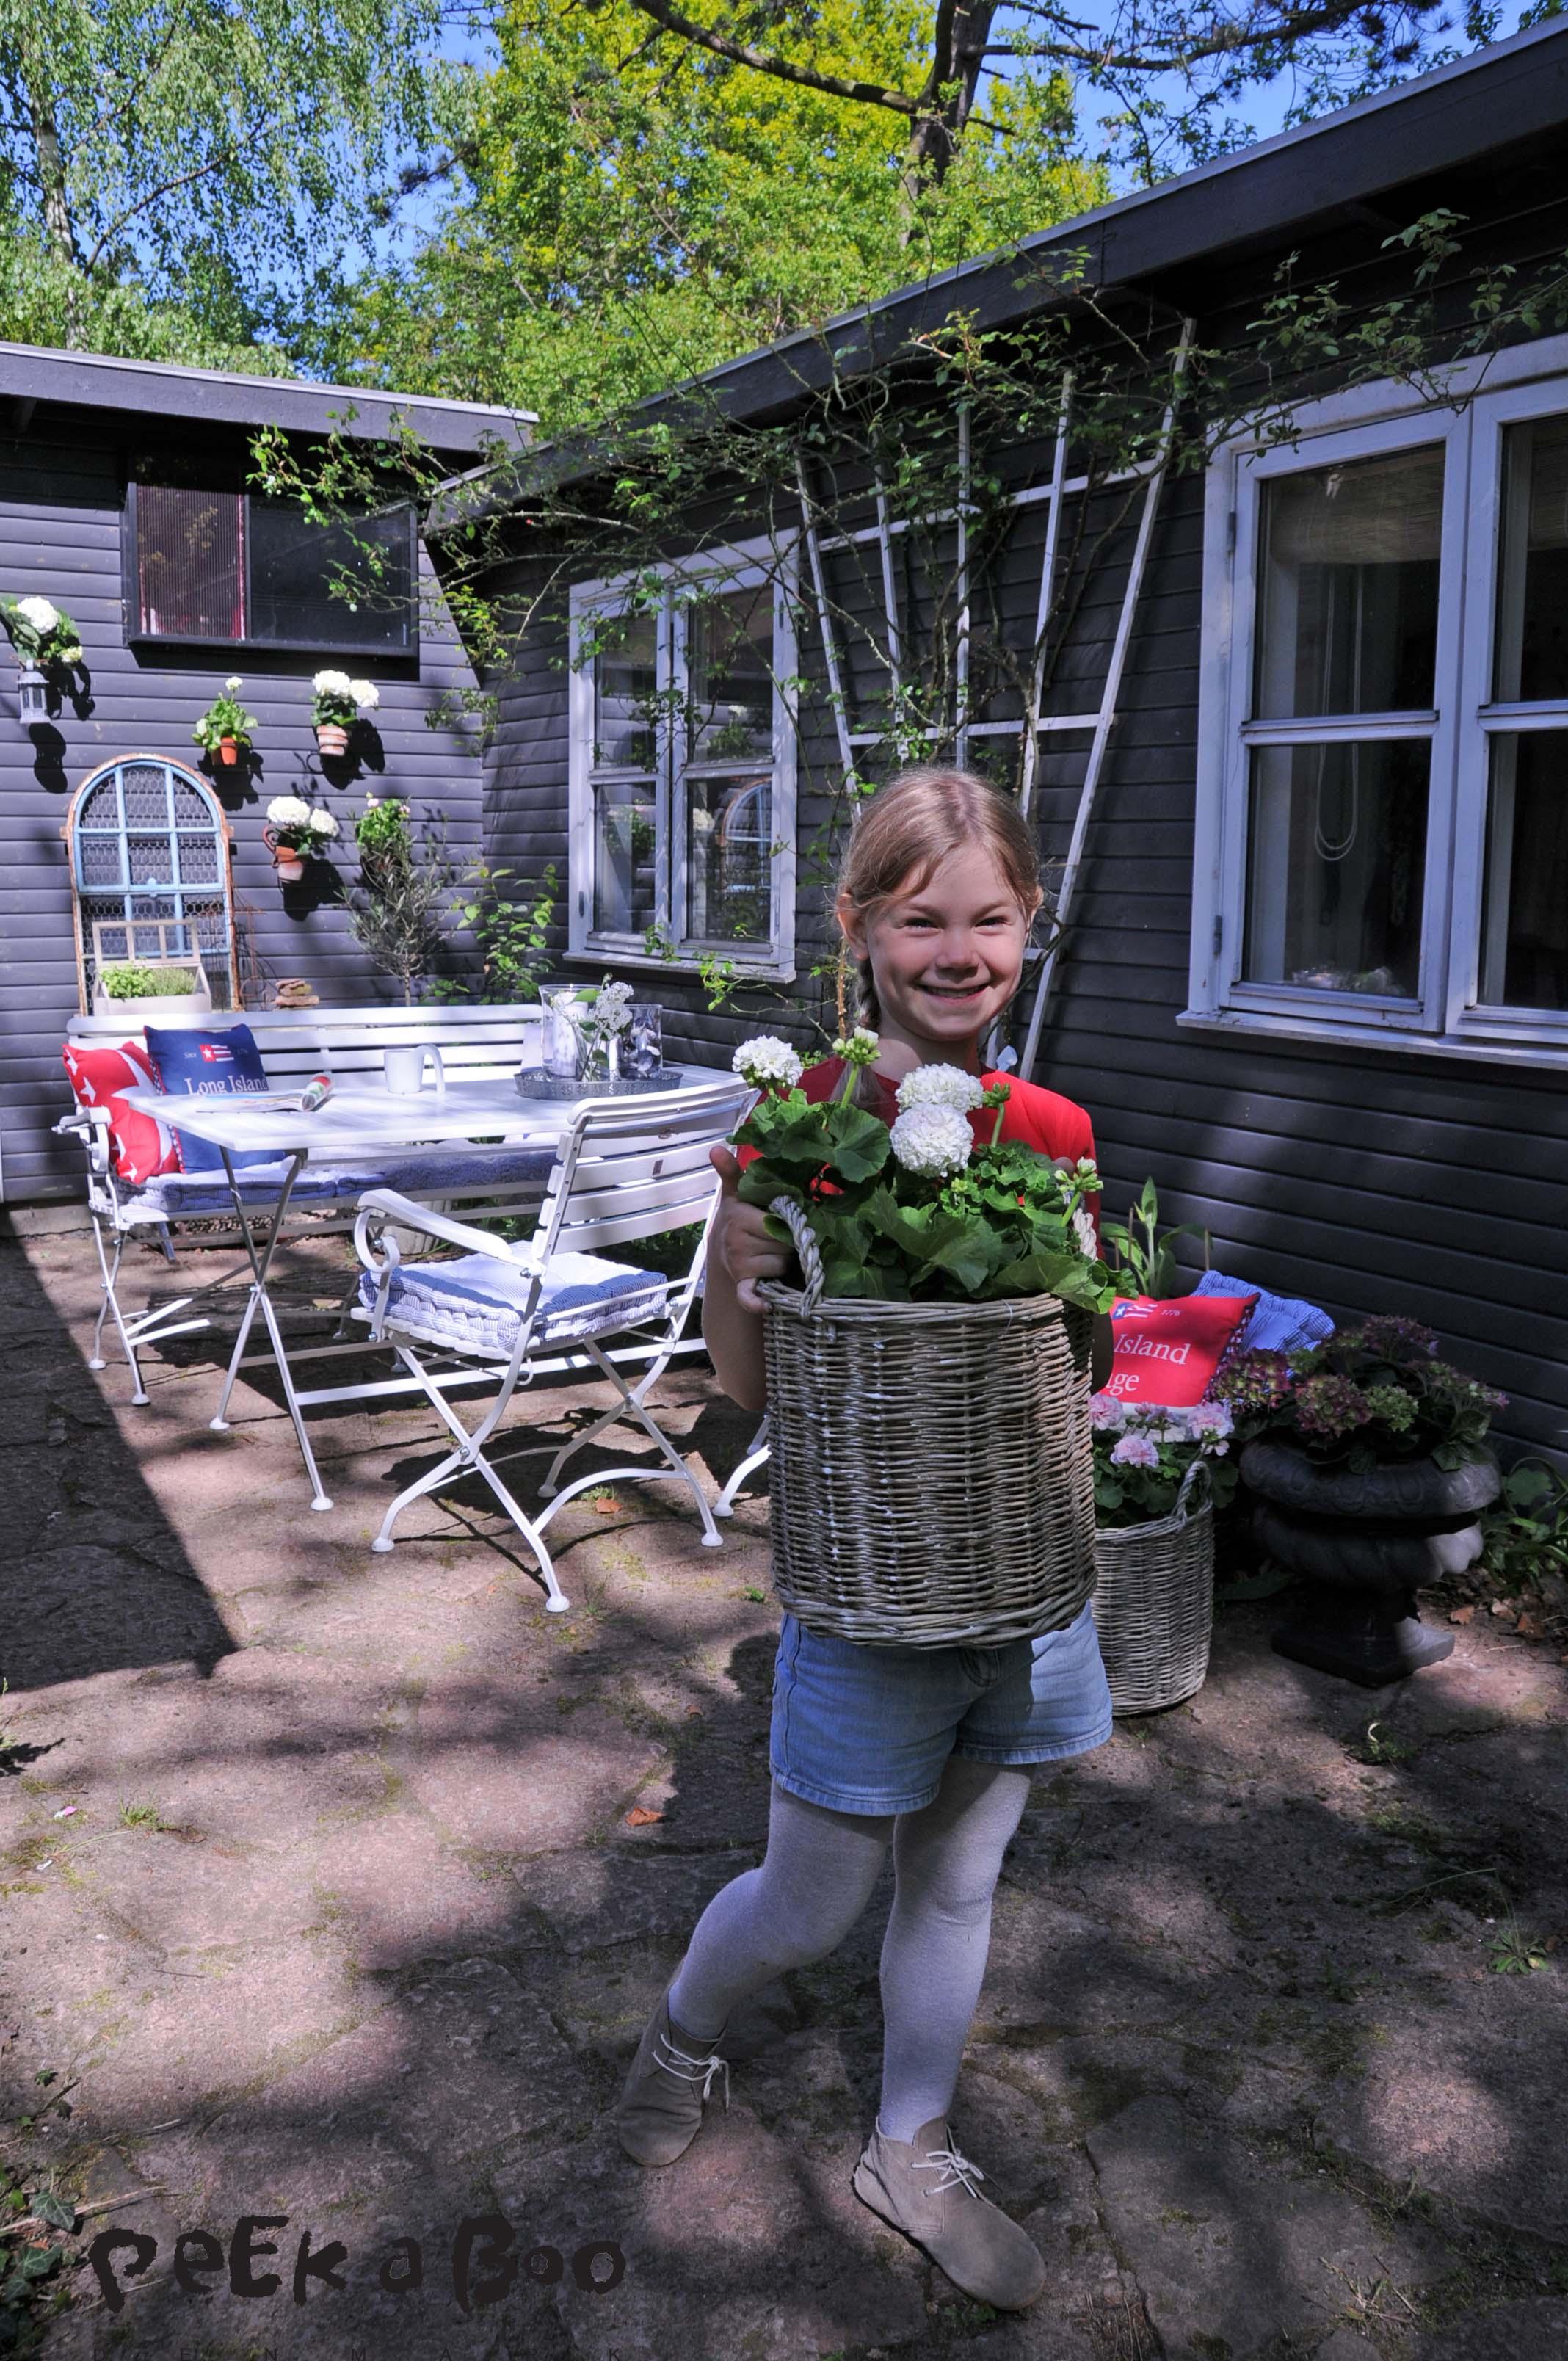 havekrukke sæt kubb, pil, jysk, floradania, pelagonia, Den lille hjælper, Flora